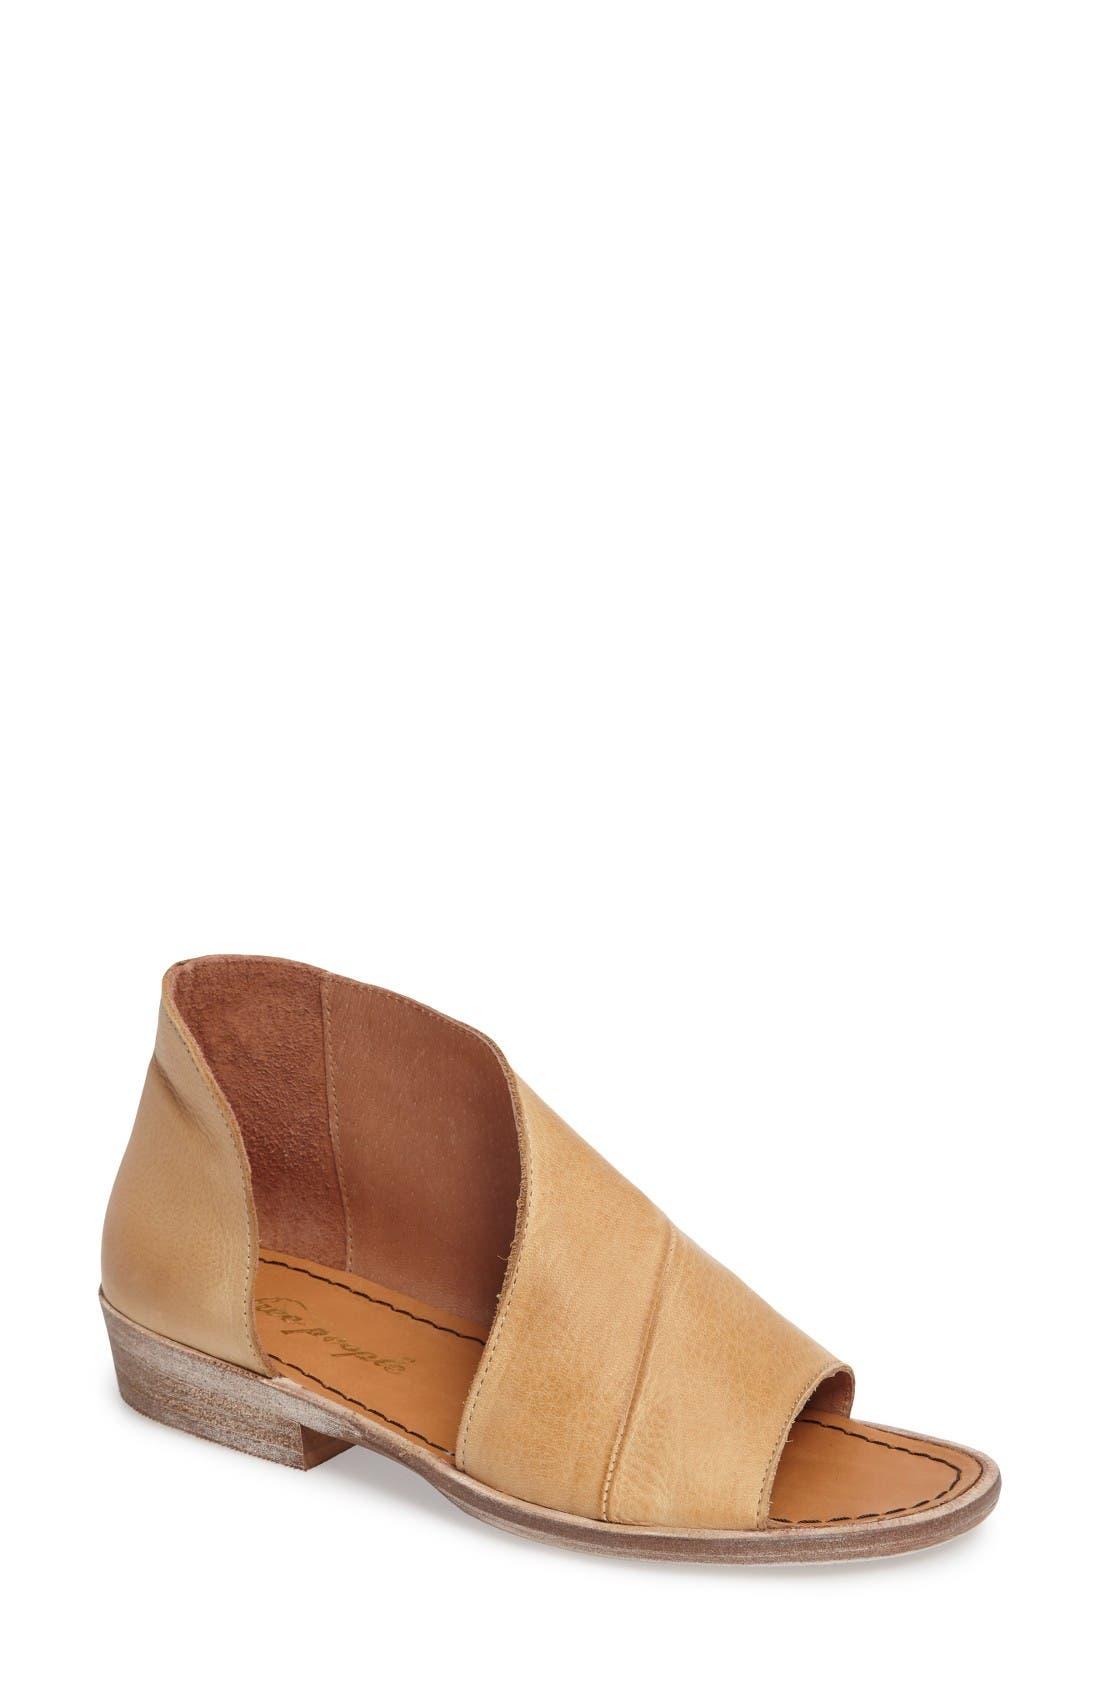 'Mont Blanc' Asymmetrical Sandal,                         Main,                         color, Natural Leather